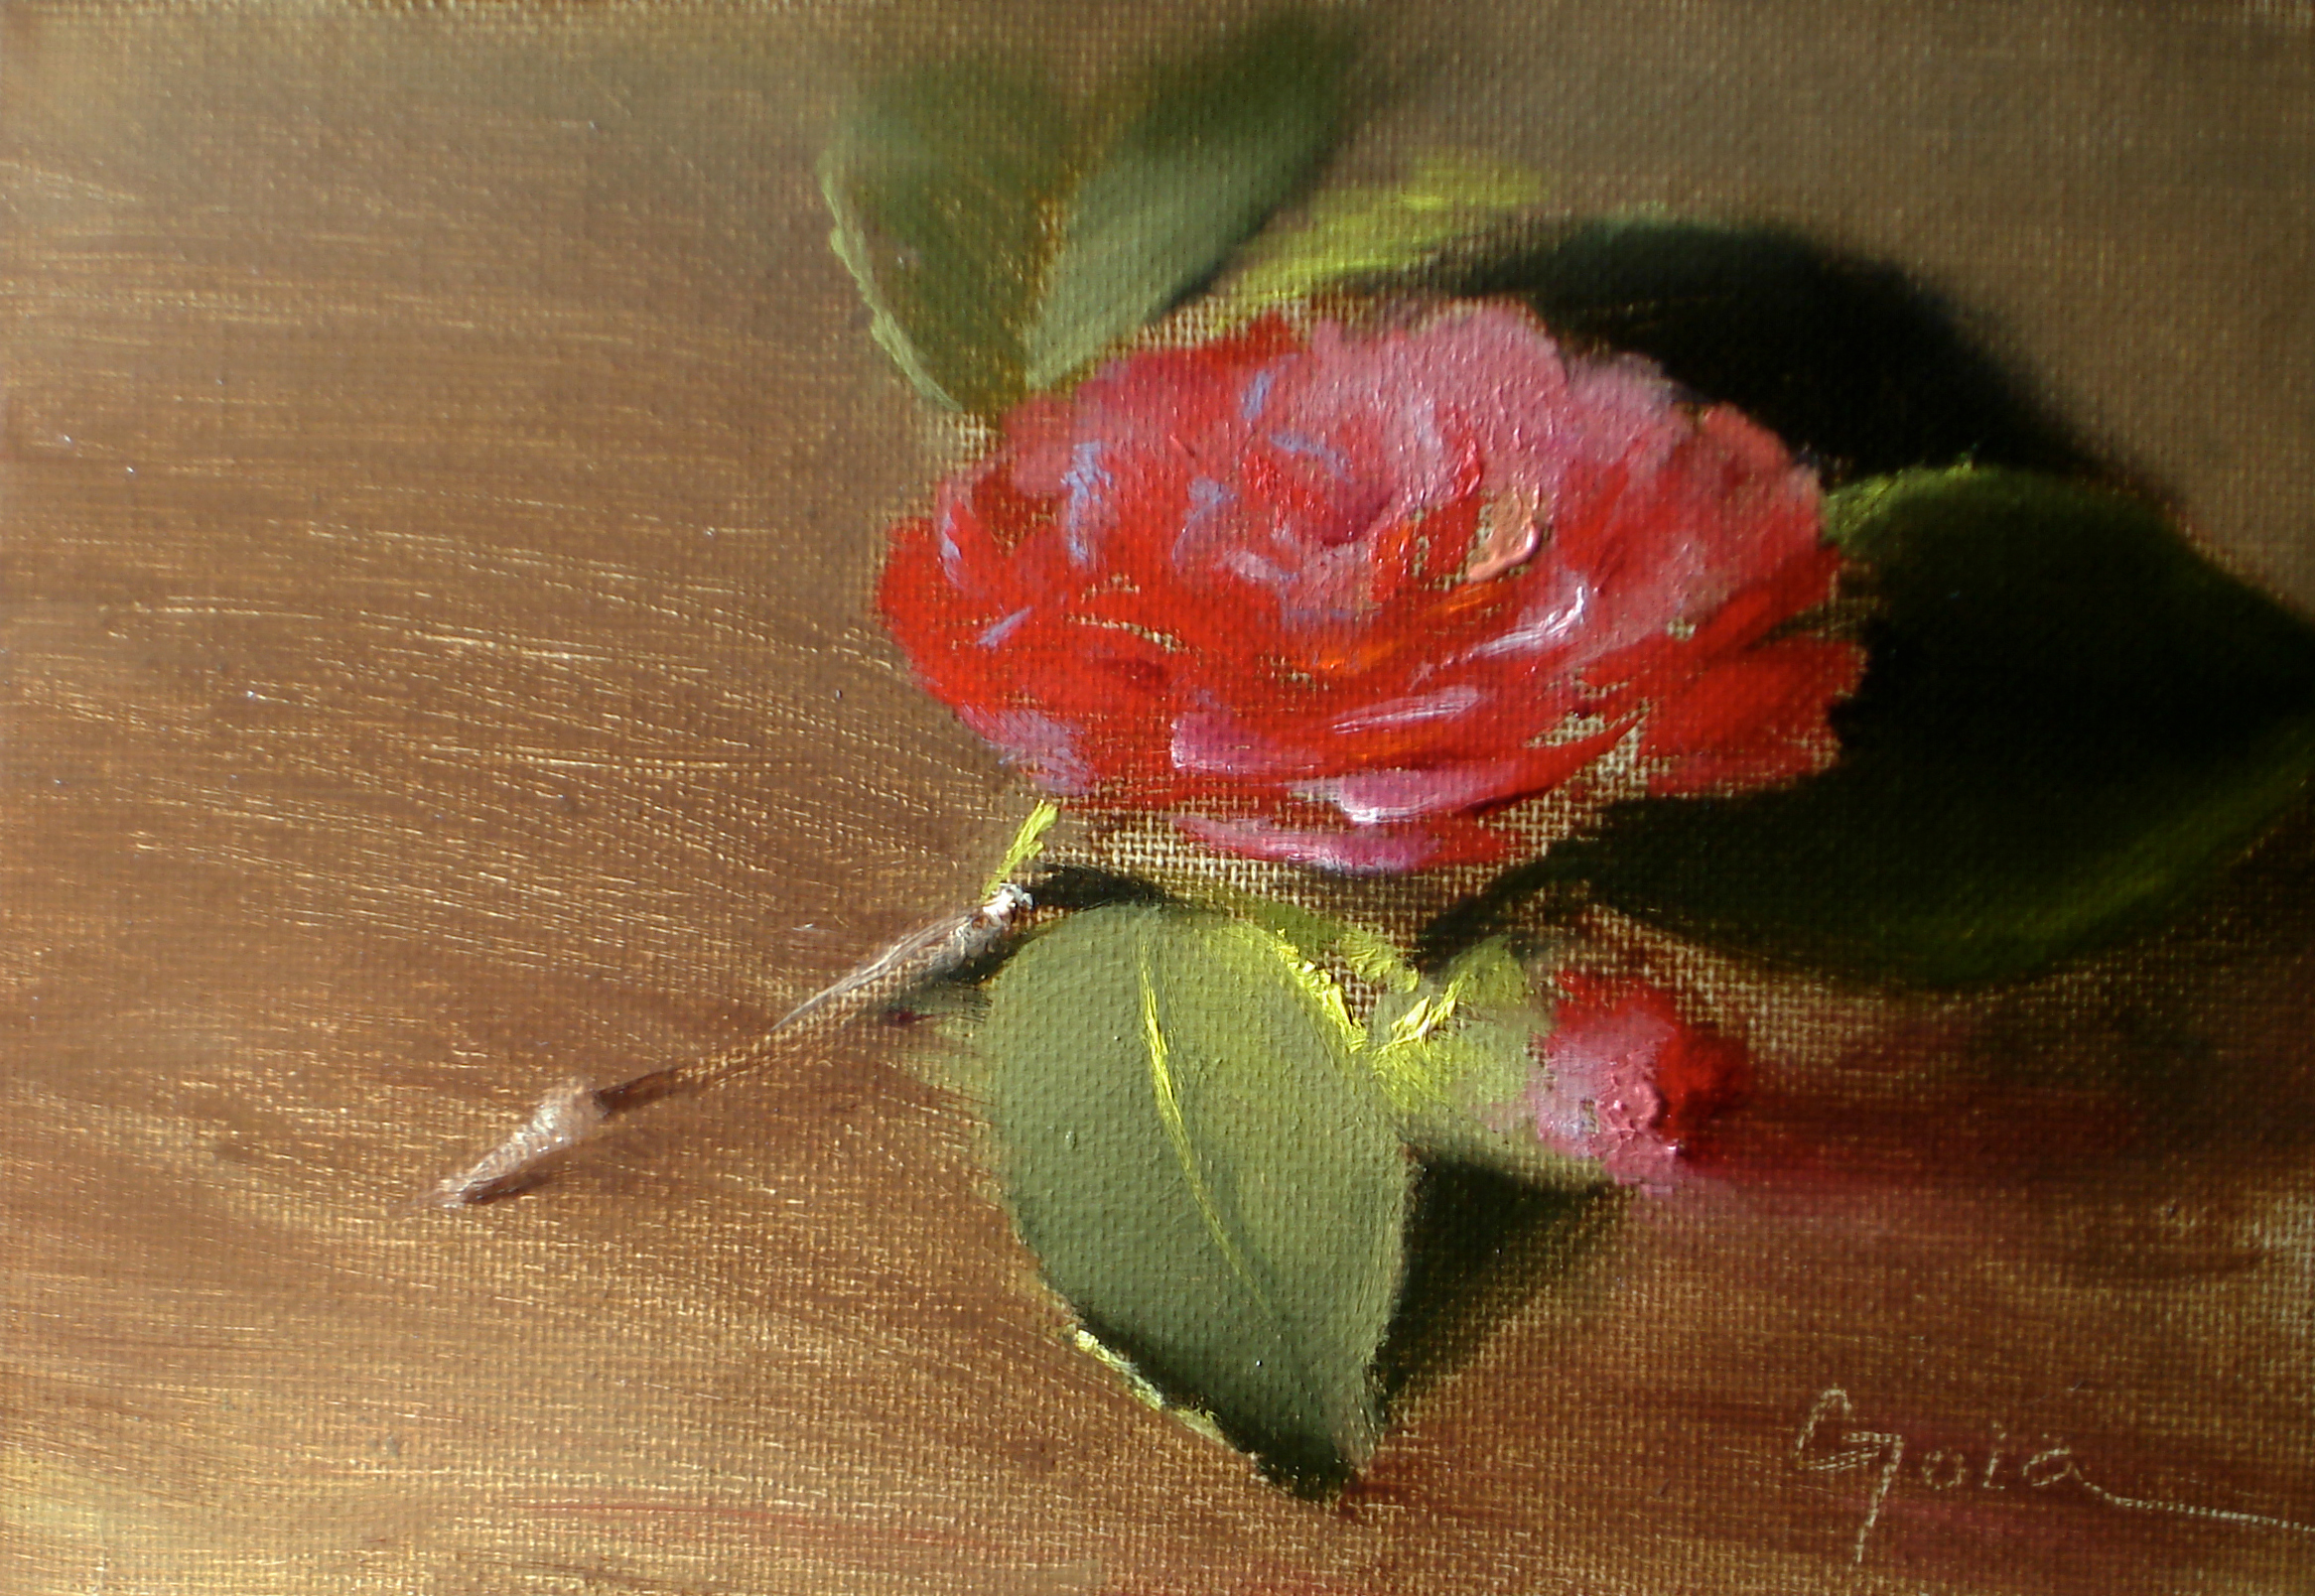 Camelliared kryitg